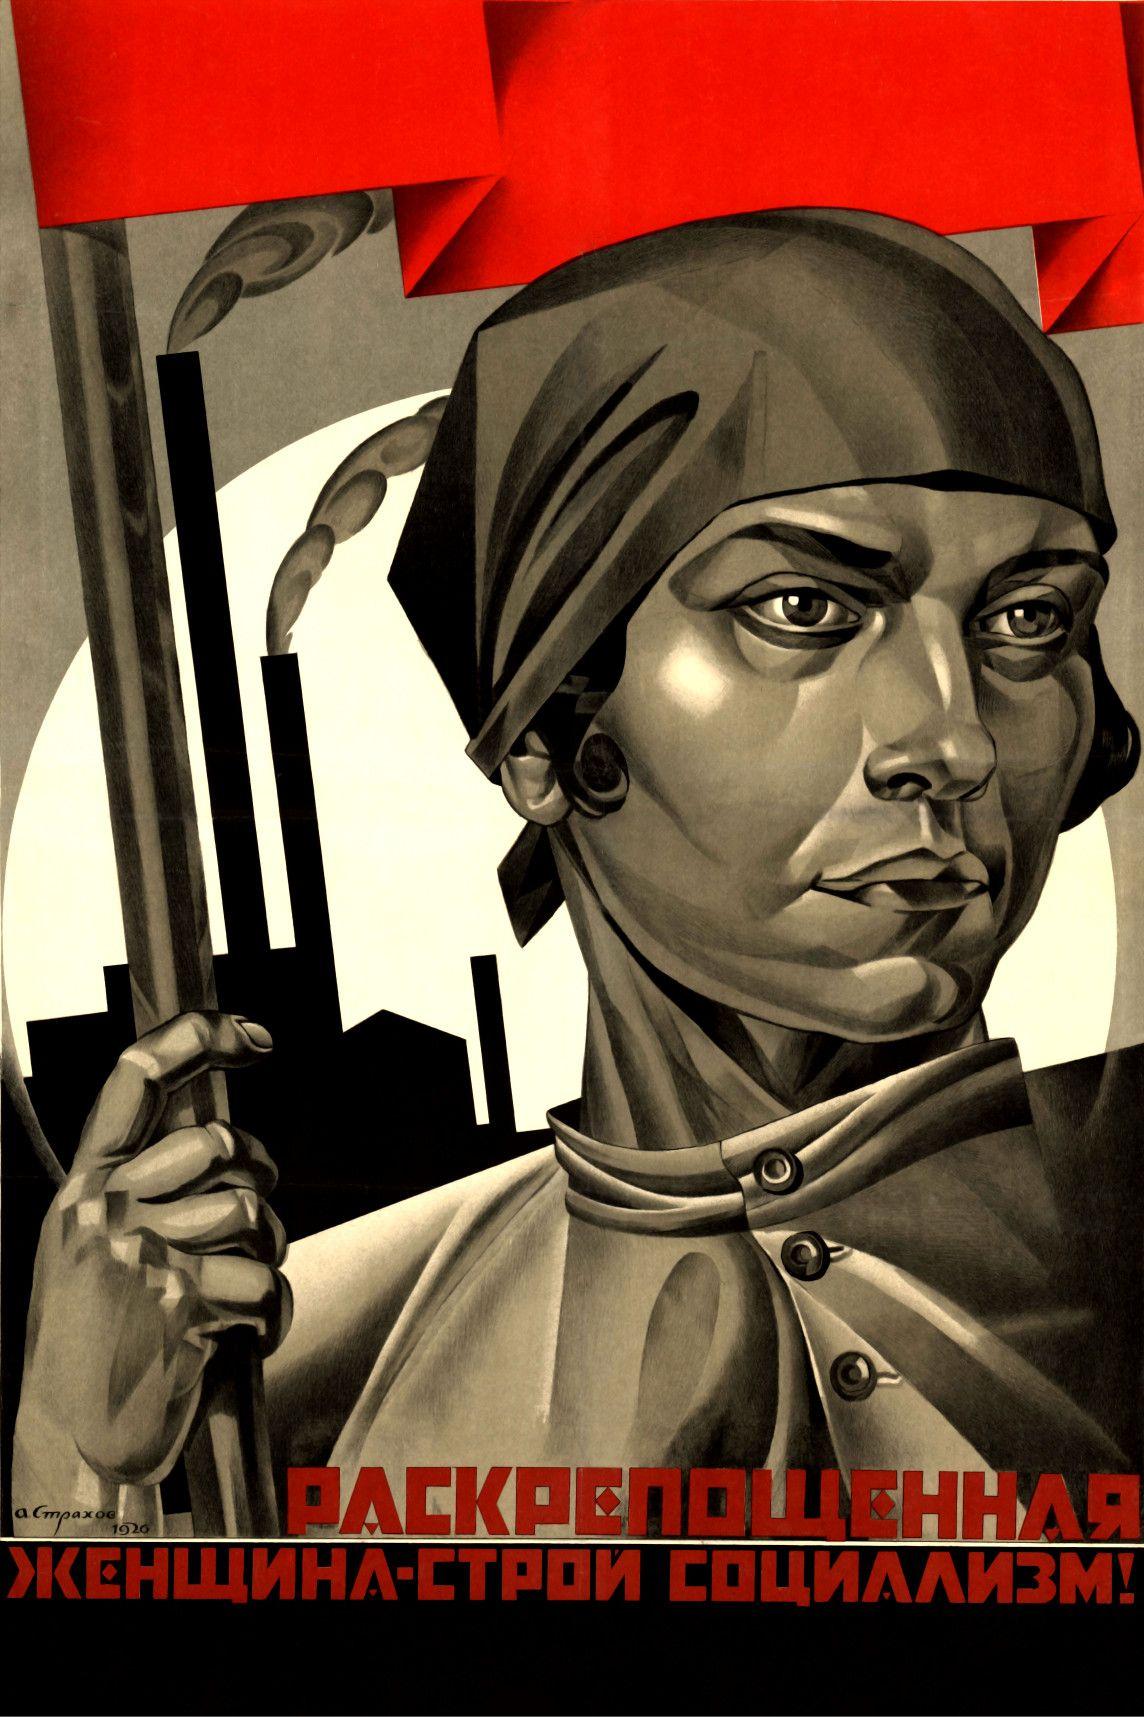 Liberated Woman poster in 2020 Propaganda art, Socialism